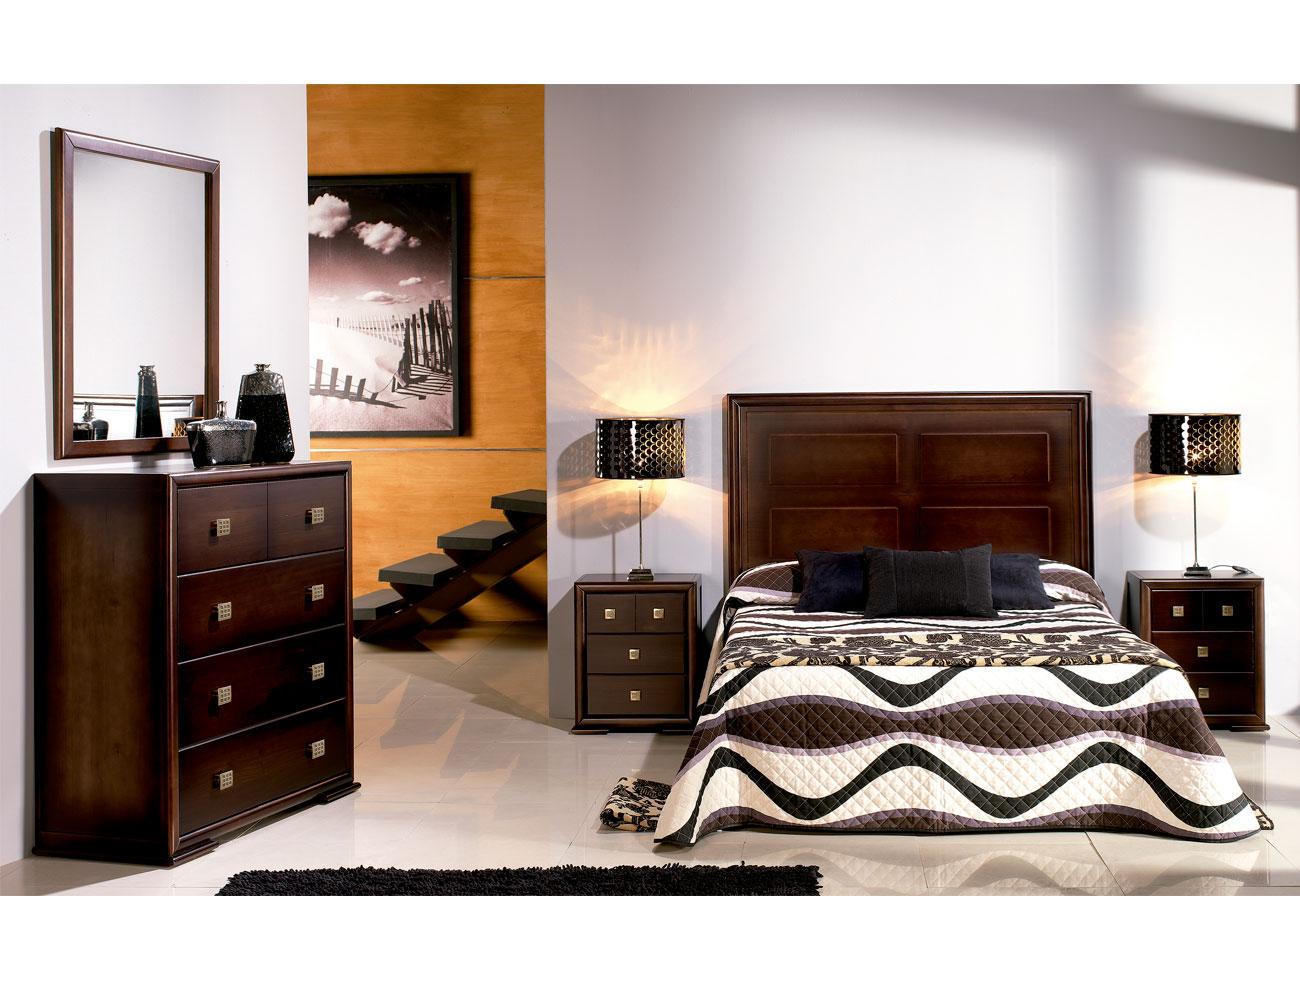 Composicion01 dormitorio matrimonio comoda madera4